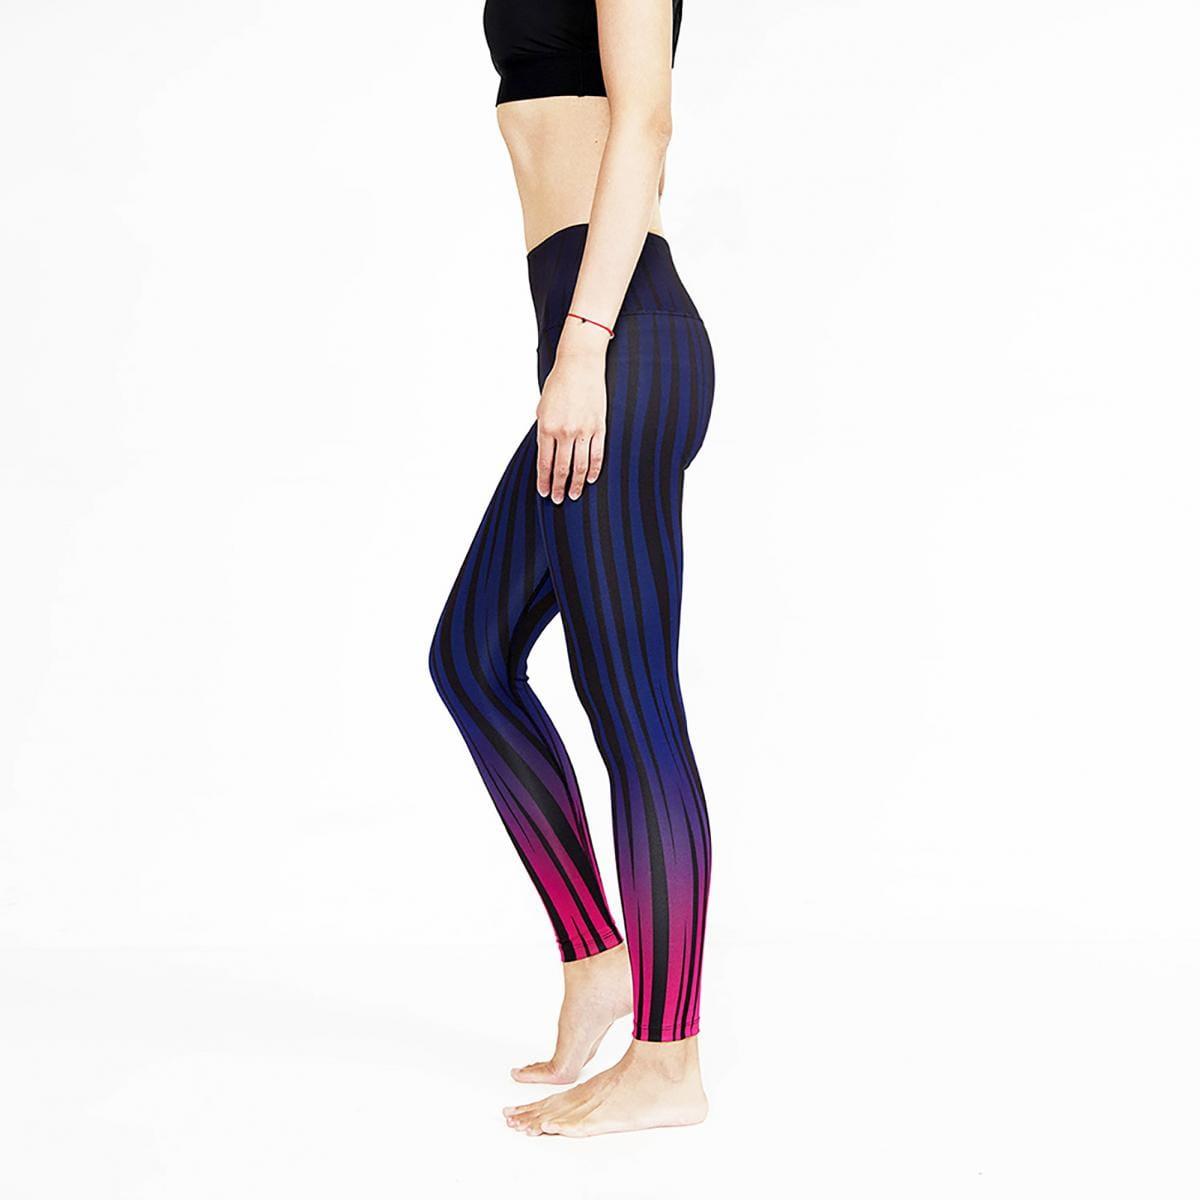 【ELASTI】典莎瑜珈褲(碘紗抗菌除臭機能)-迷幻斑馬 3